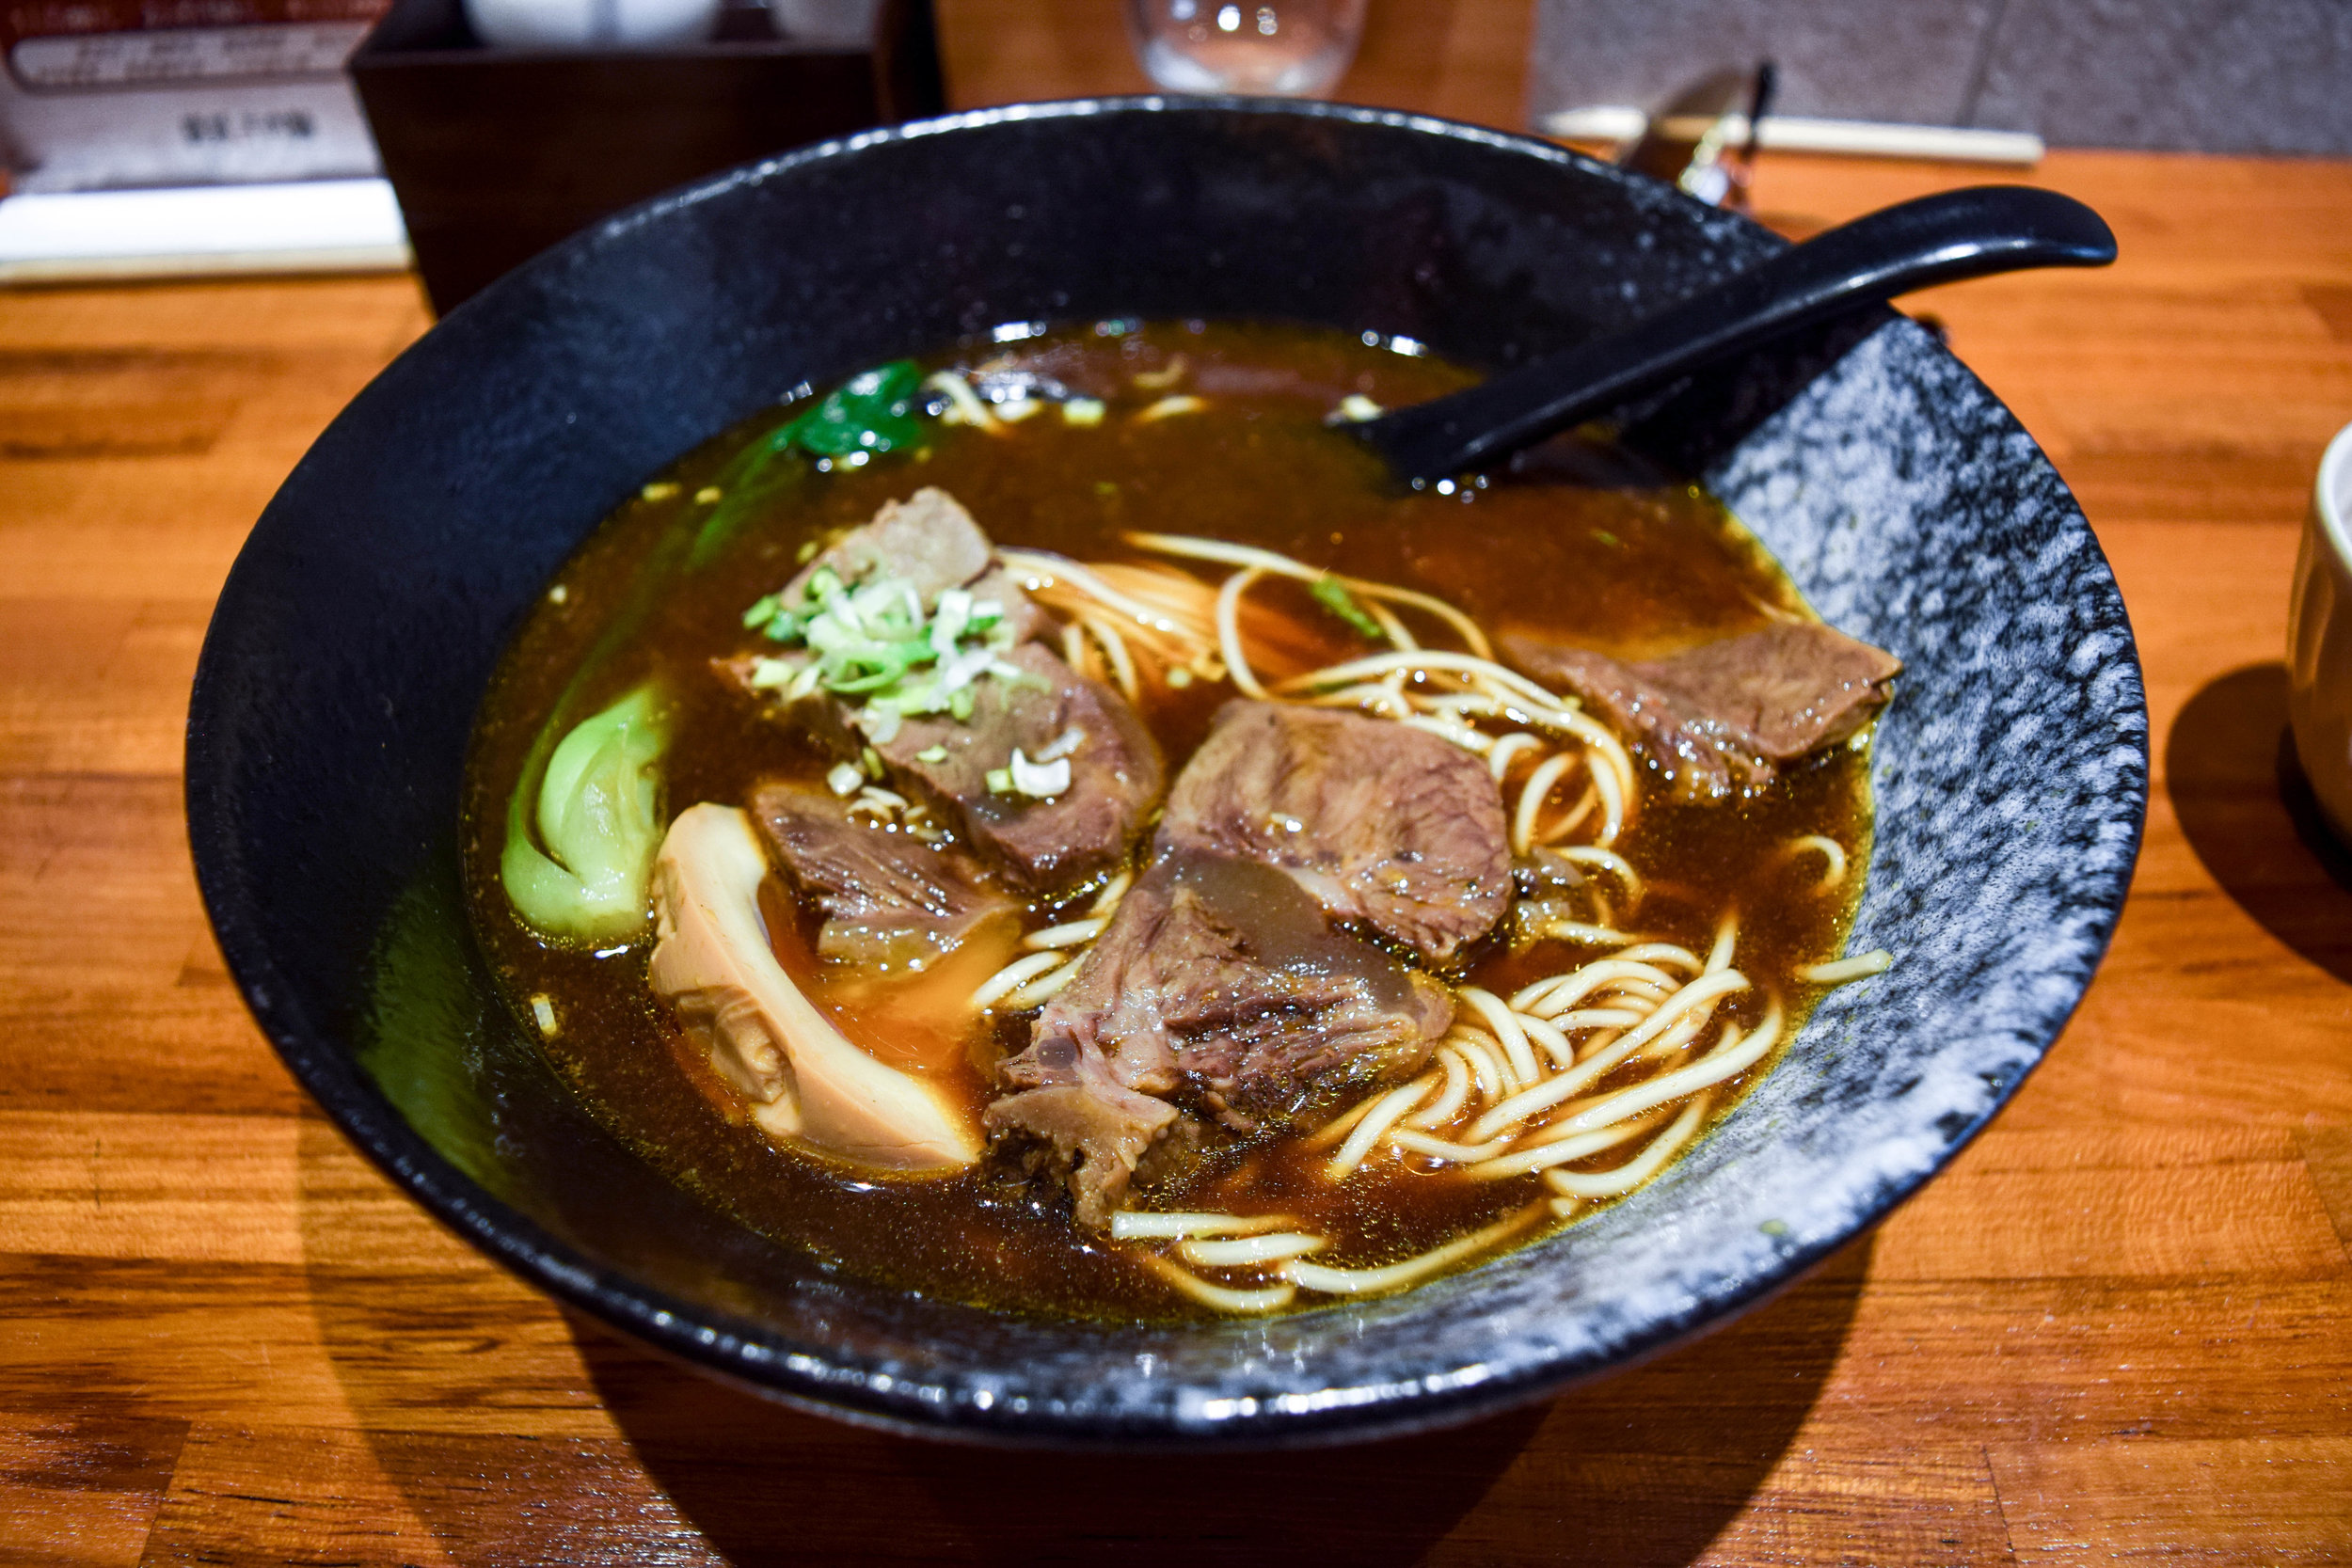 Beef noodles at C.E.O.